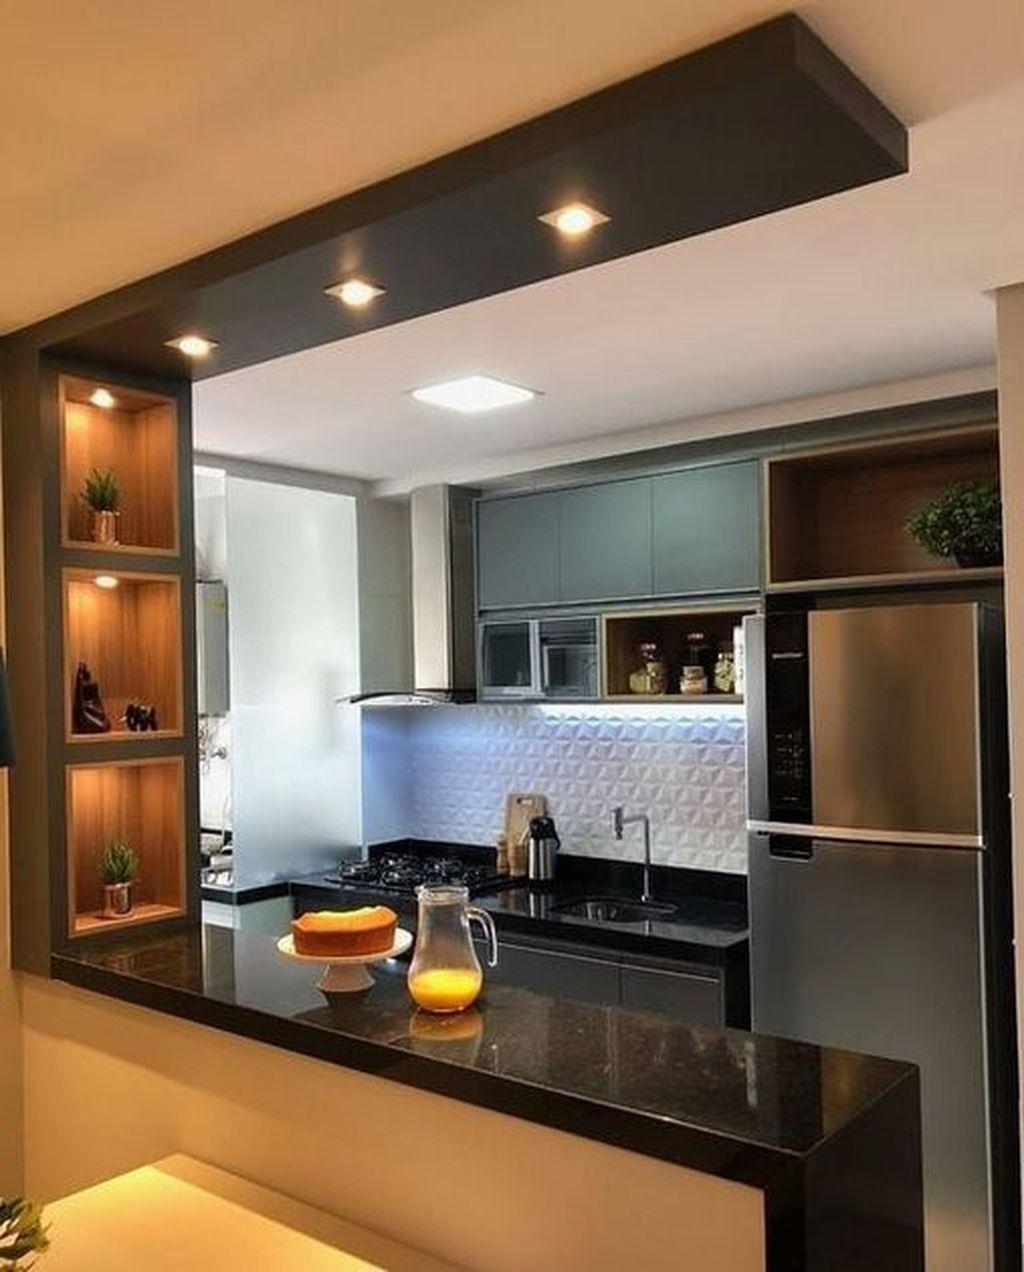 Semi Open Kitchen Designs: 20+ Unordinary Kitchen Colors Design Ideas That Looks Cool